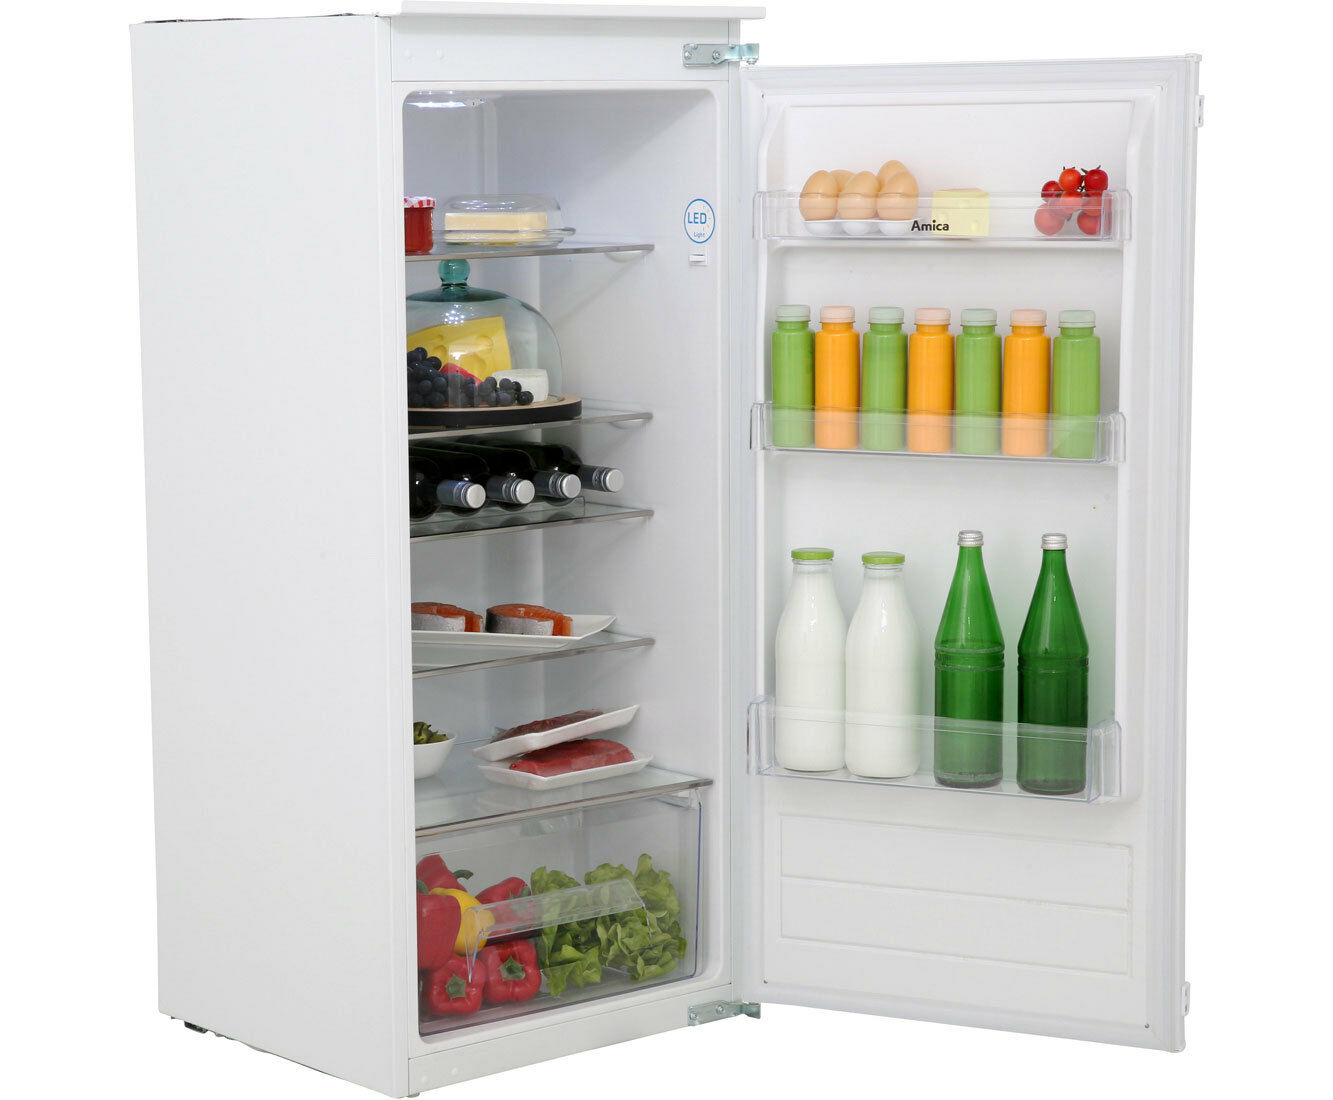 Amica Kühlschrank Vks 15422 W : Amica evks 16175 7.34 cu ft kühlschrank ebay